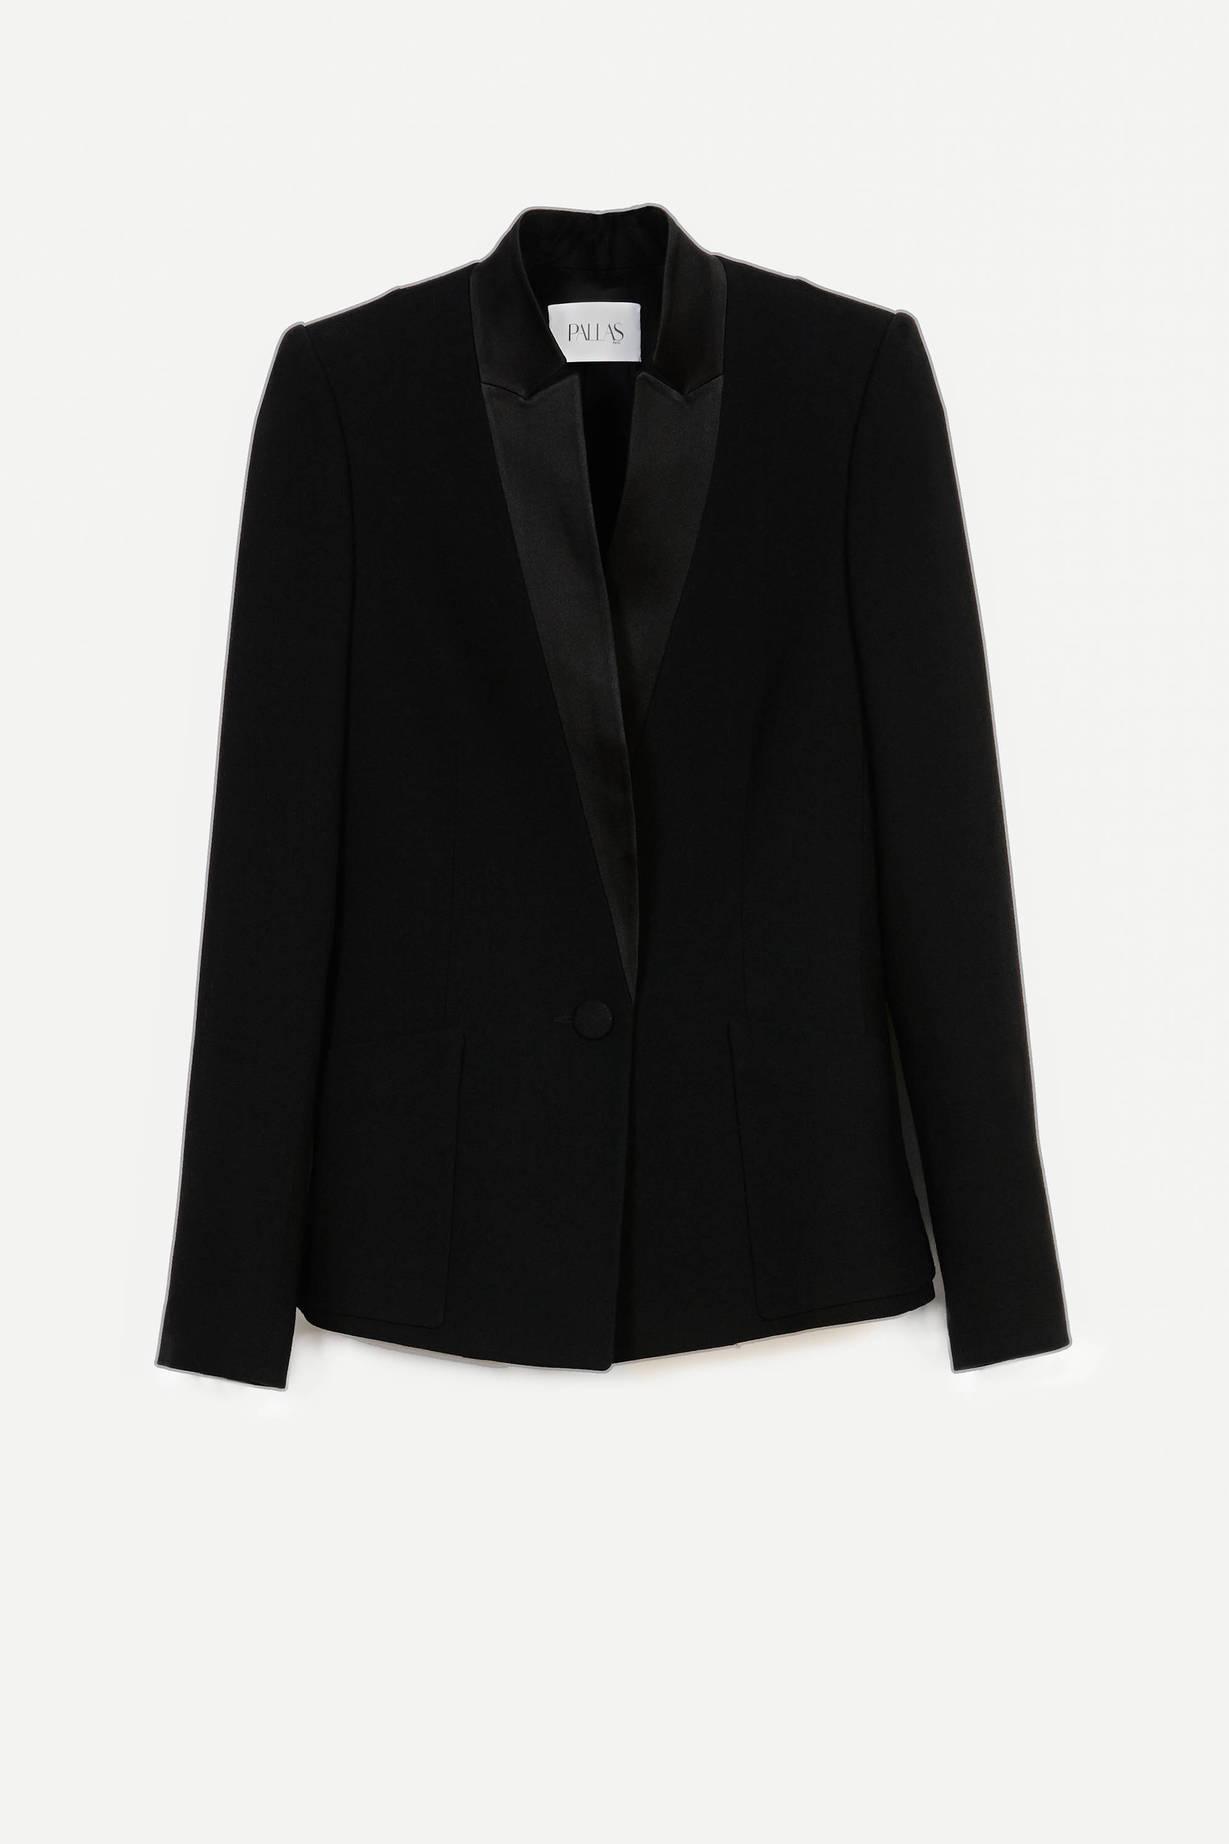 Pallas Centaure Jacket